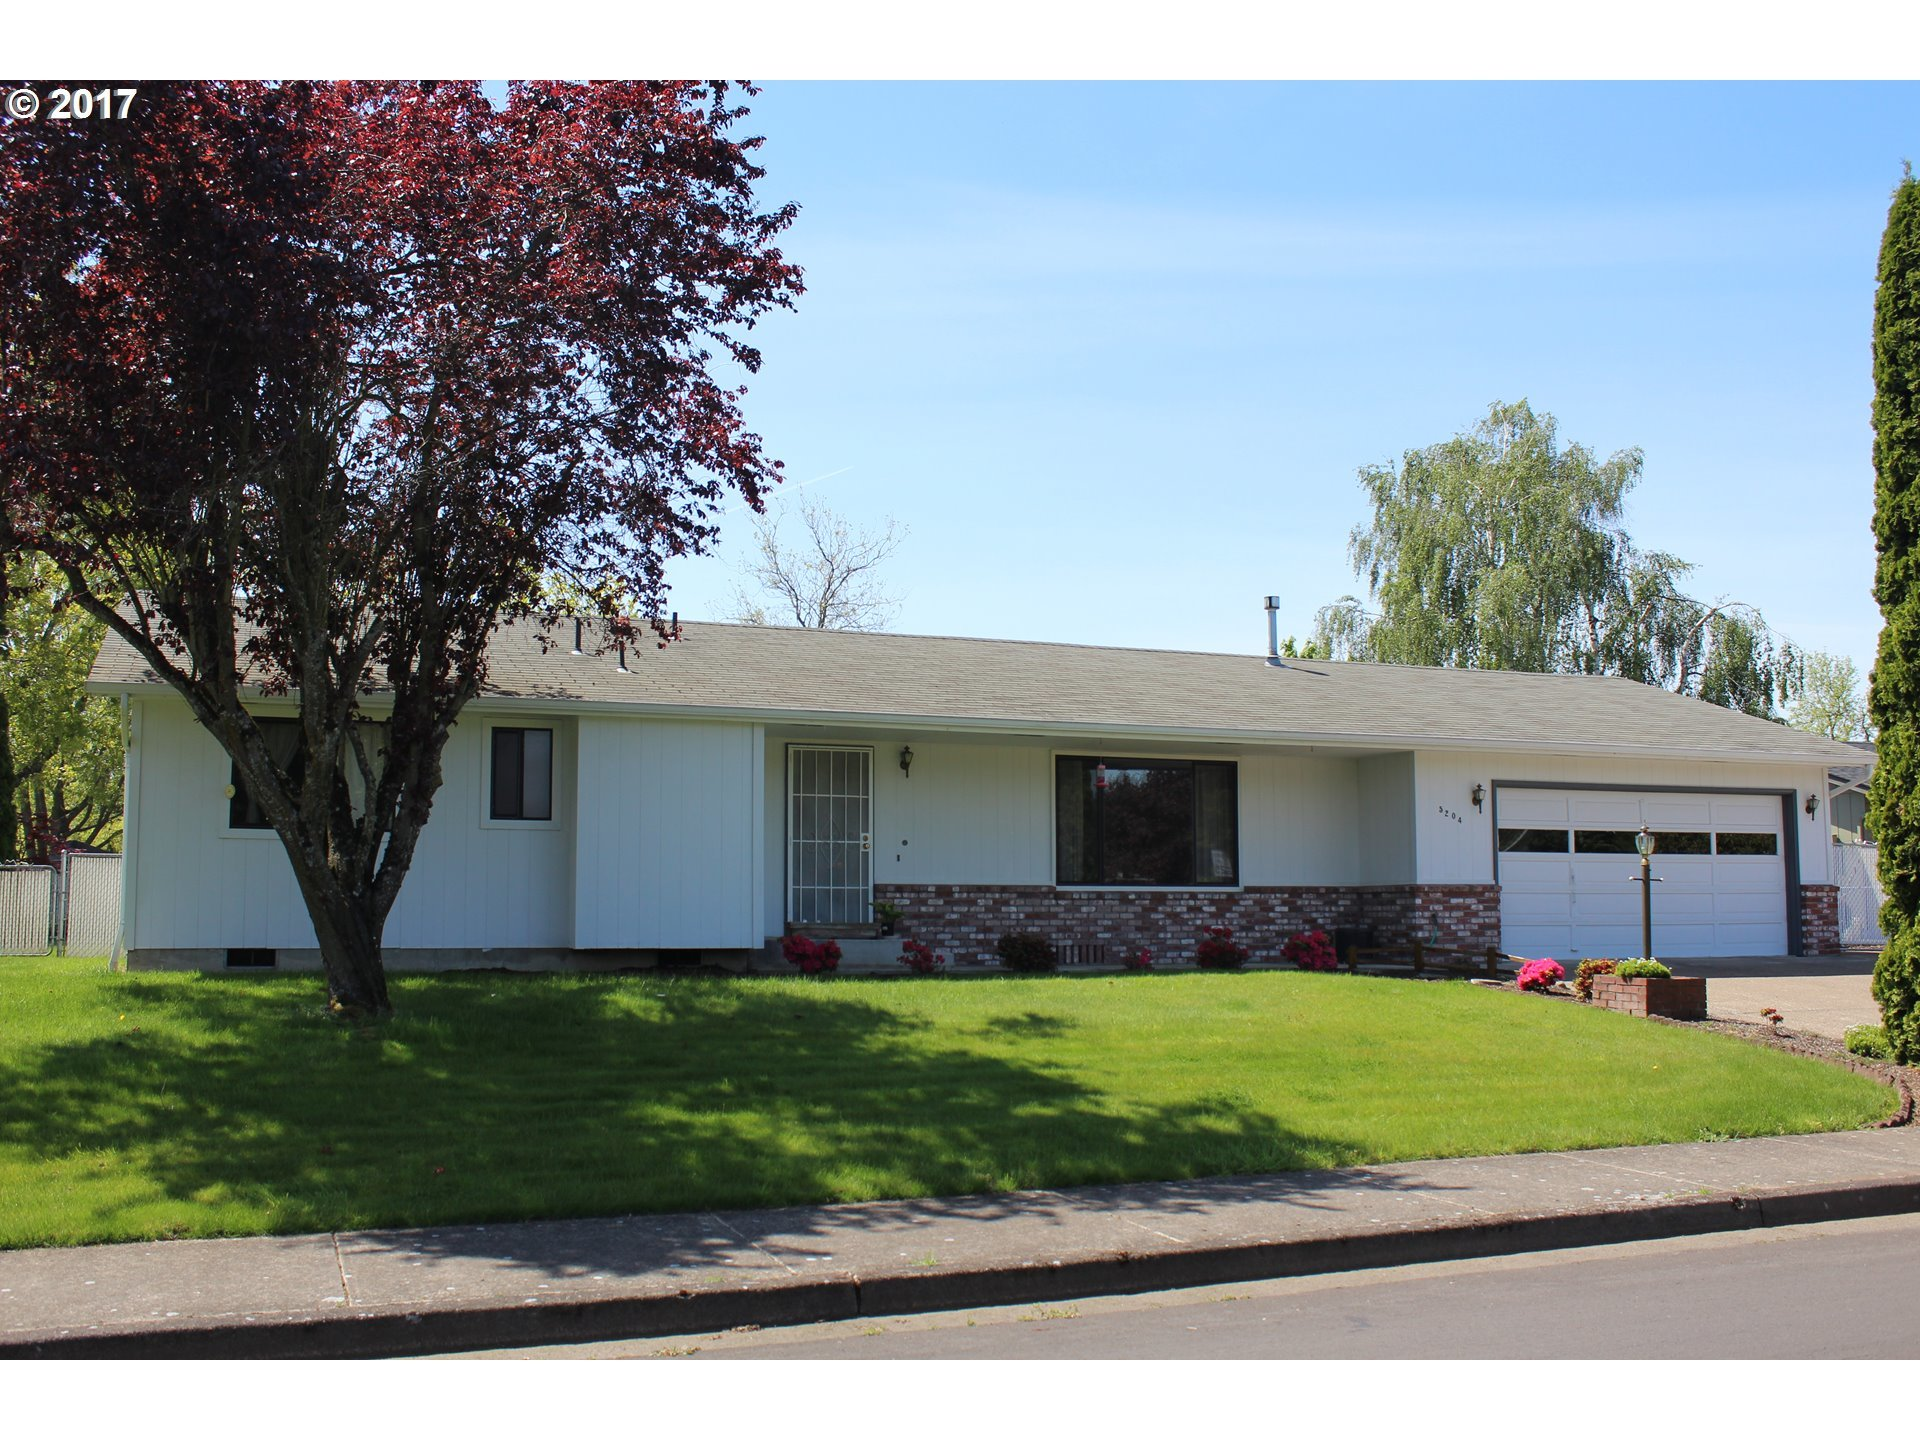 5204 Sugarpine Cir, Eugene, OR   MLS# 17007042   Roseburg